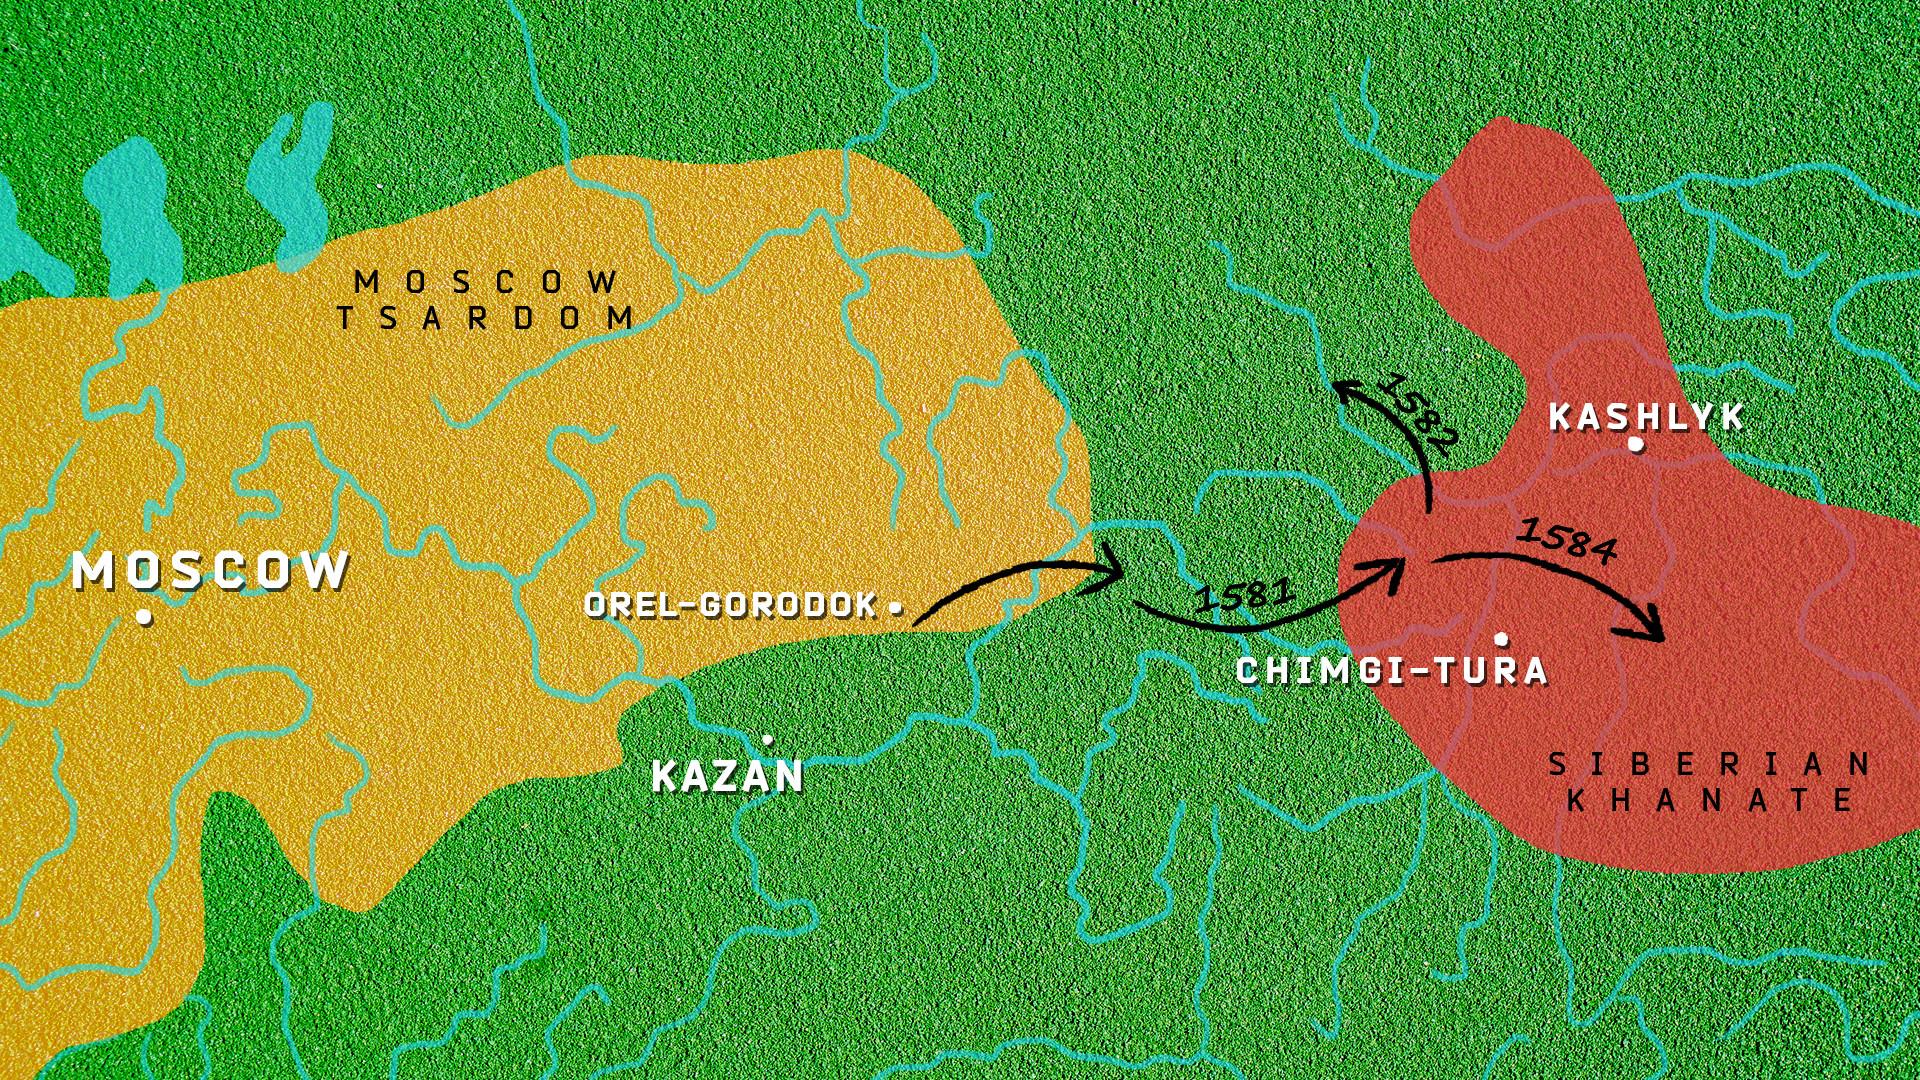 Peta Ketsaran Moskow dibandingkan dengan Kekhanan Sibir. Panah hitam menunjukkan perkiraan rute pasukan Yermak.